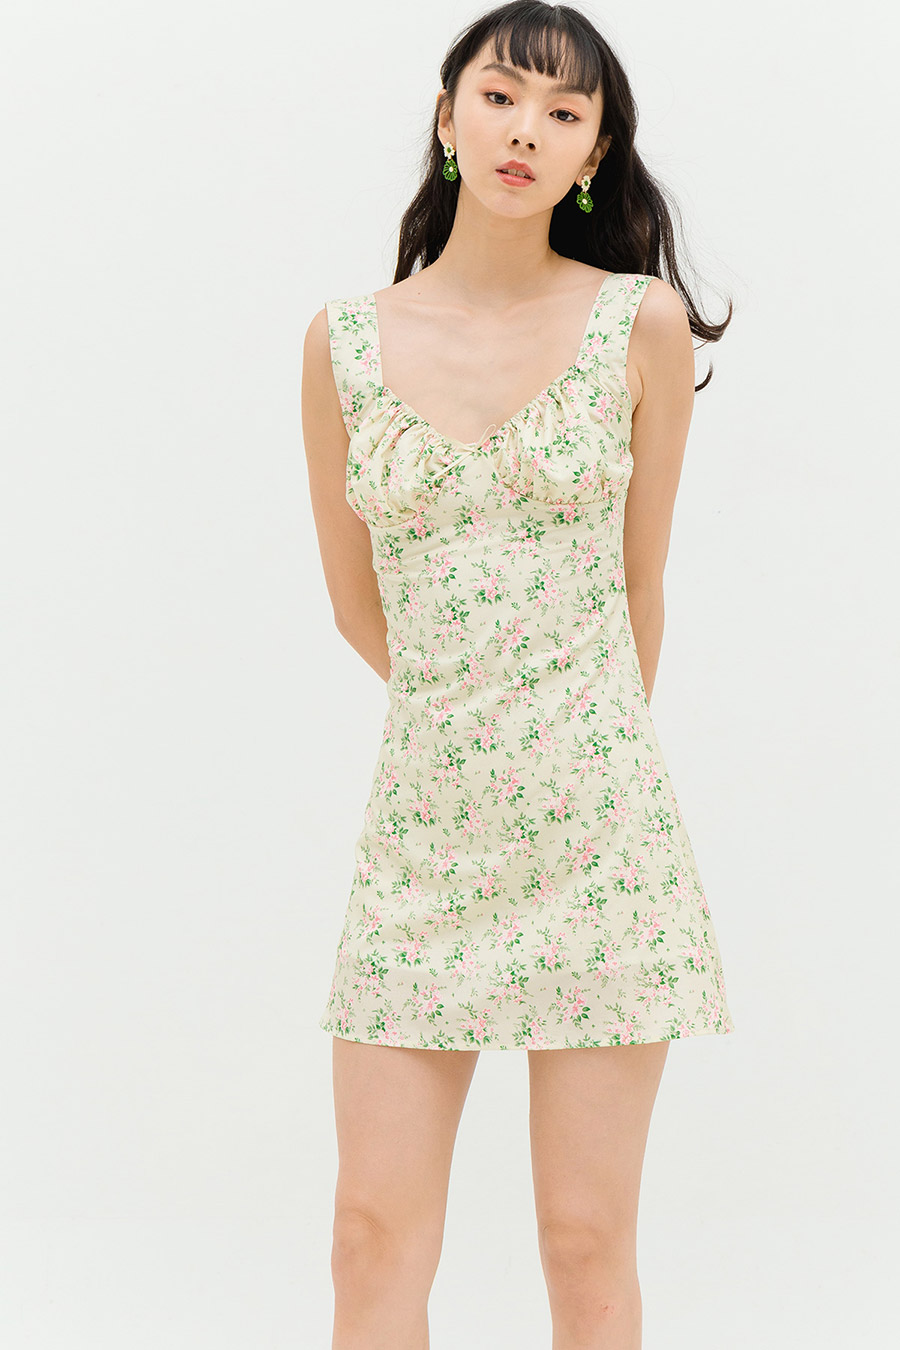 SADIE DRESS - VANILLA FLEUR